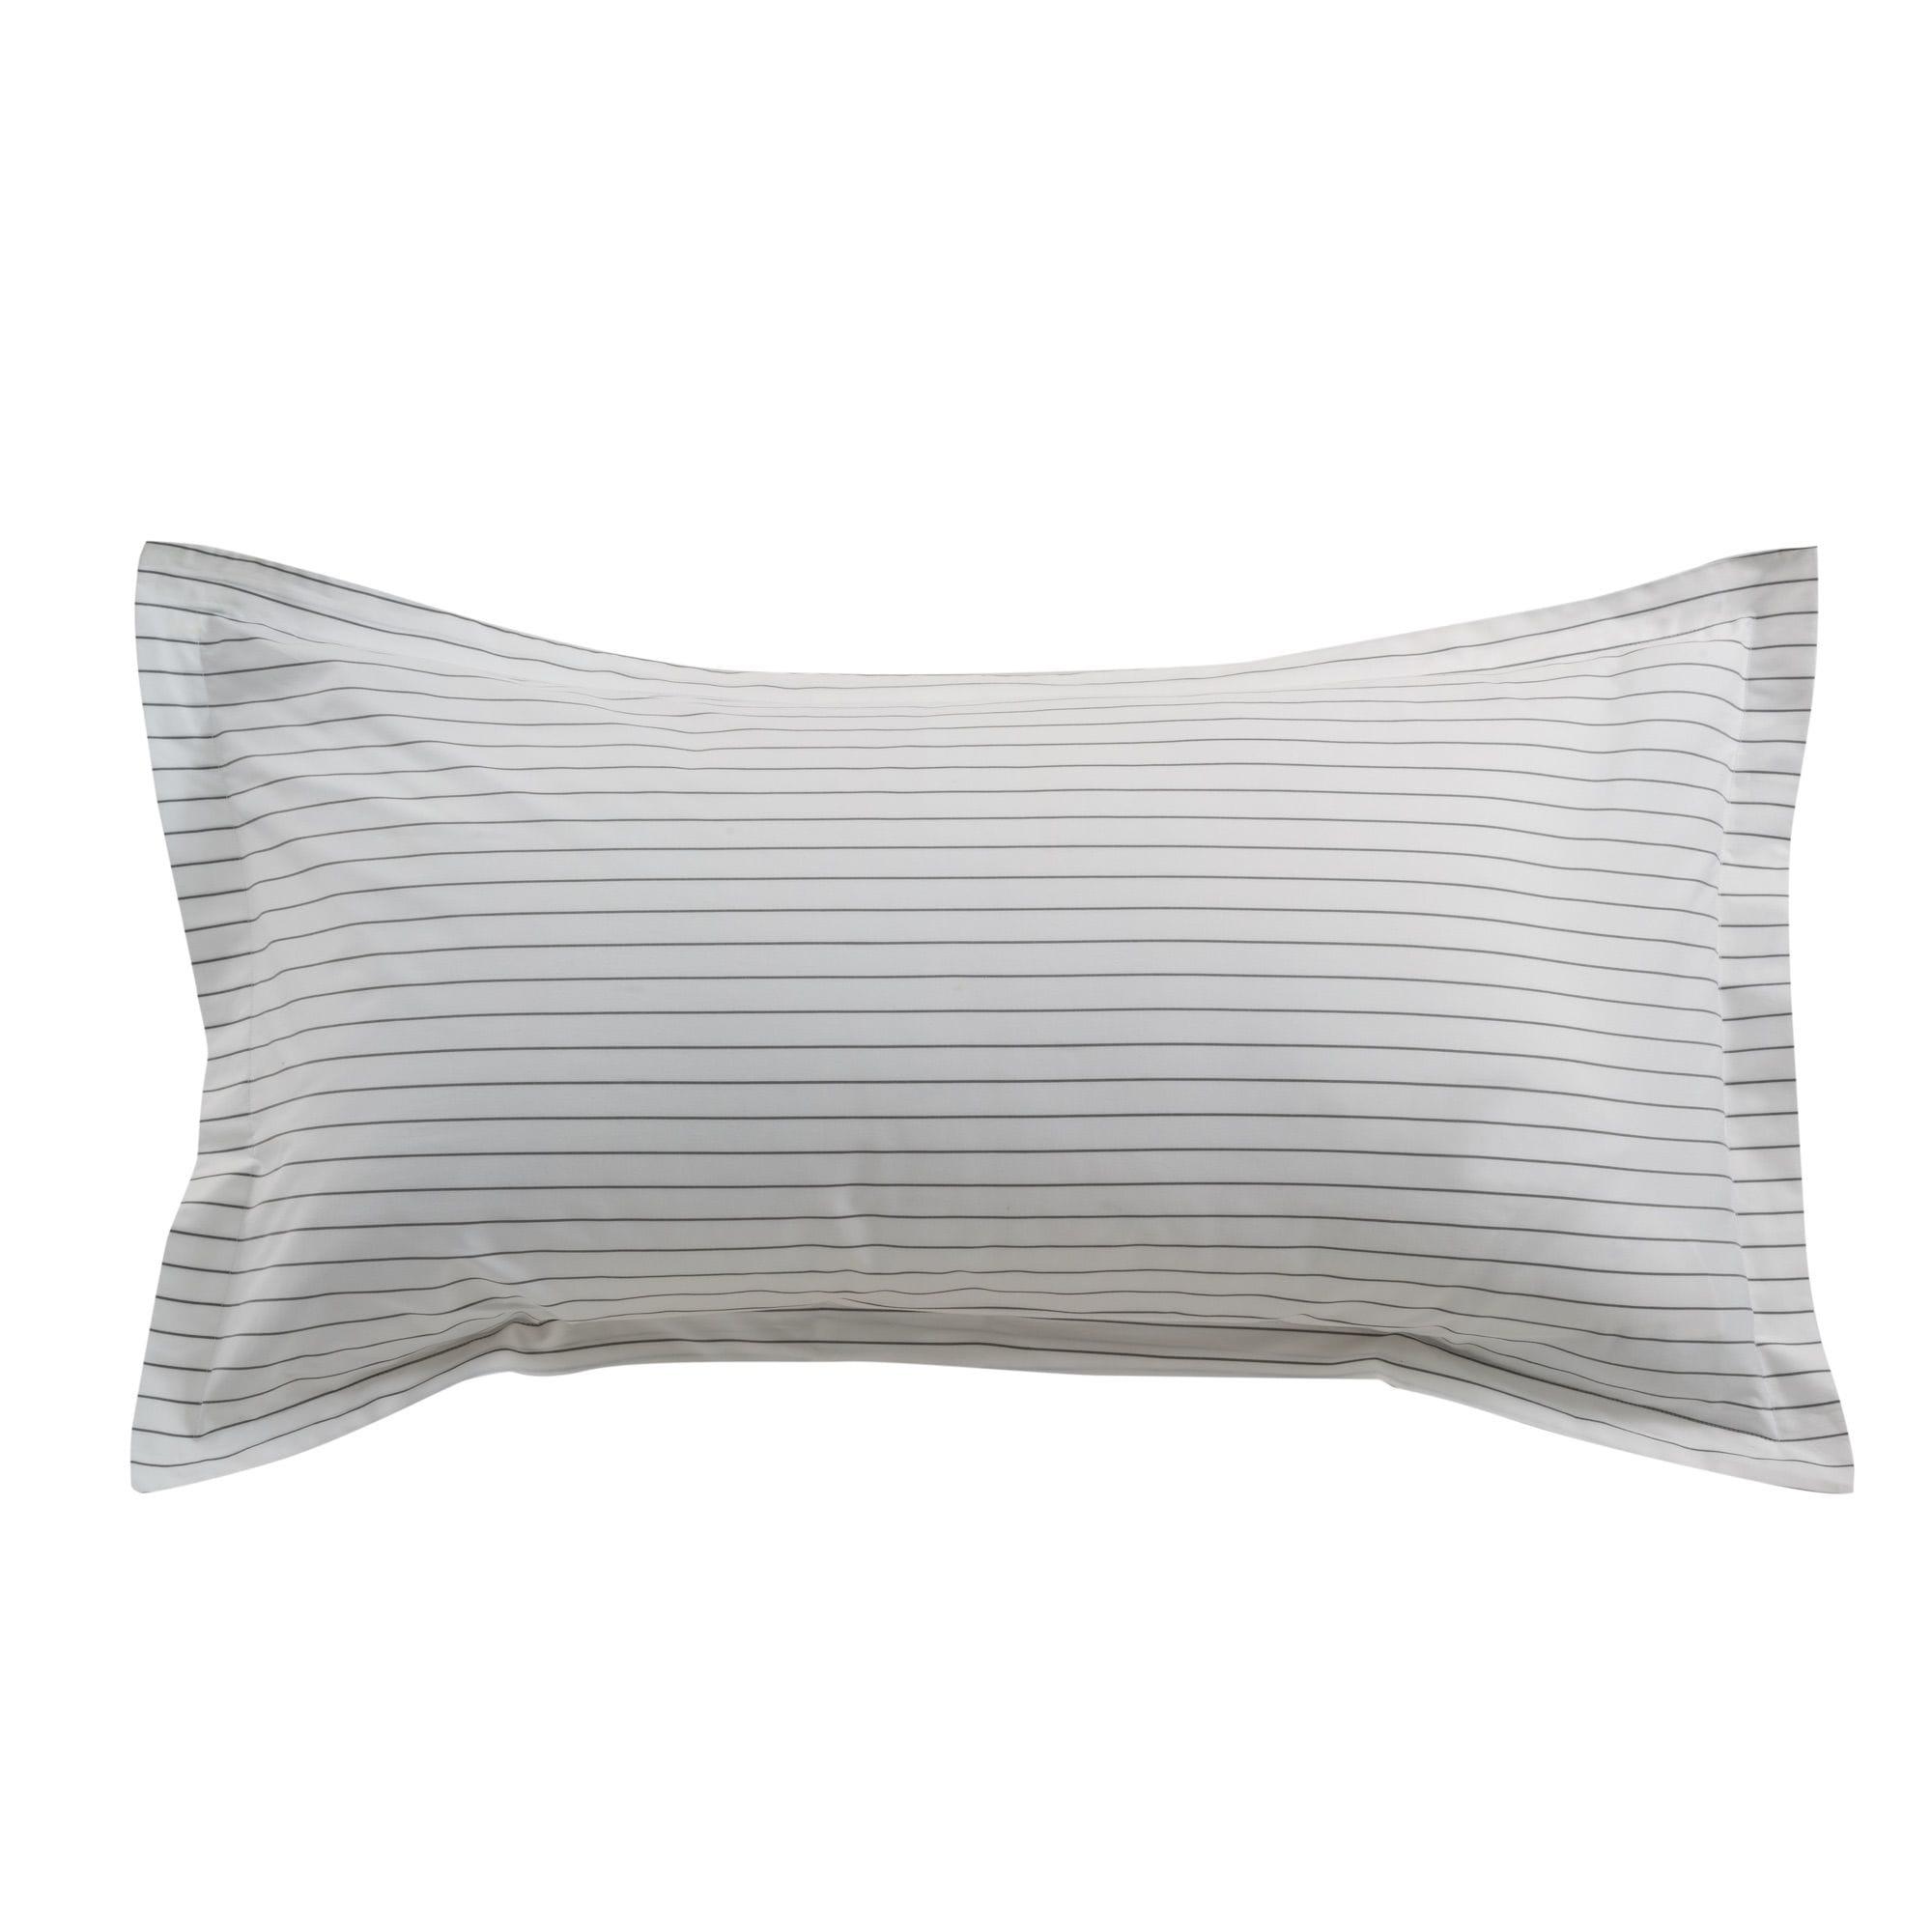 Linens & Bedding by ELEGANT STRAND seen at Private Residence - Boca Raton, FL, Boca Raton - Portofino Oxford Stripe Sheet Set